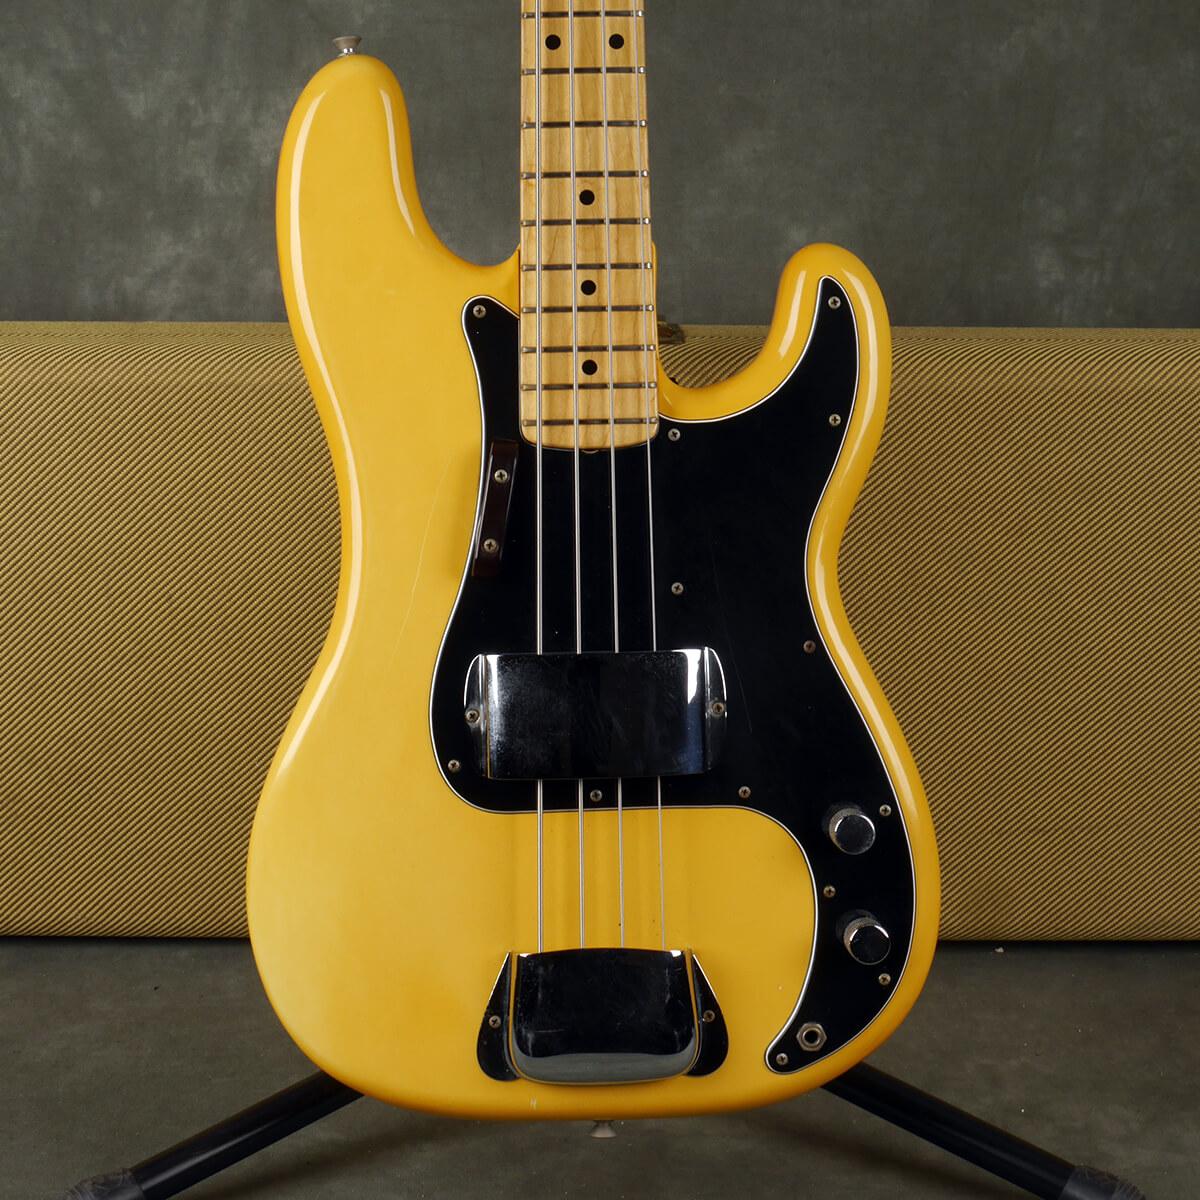 Fender 1973 Precision Bass - White w/Hard Case - 2nd Hand